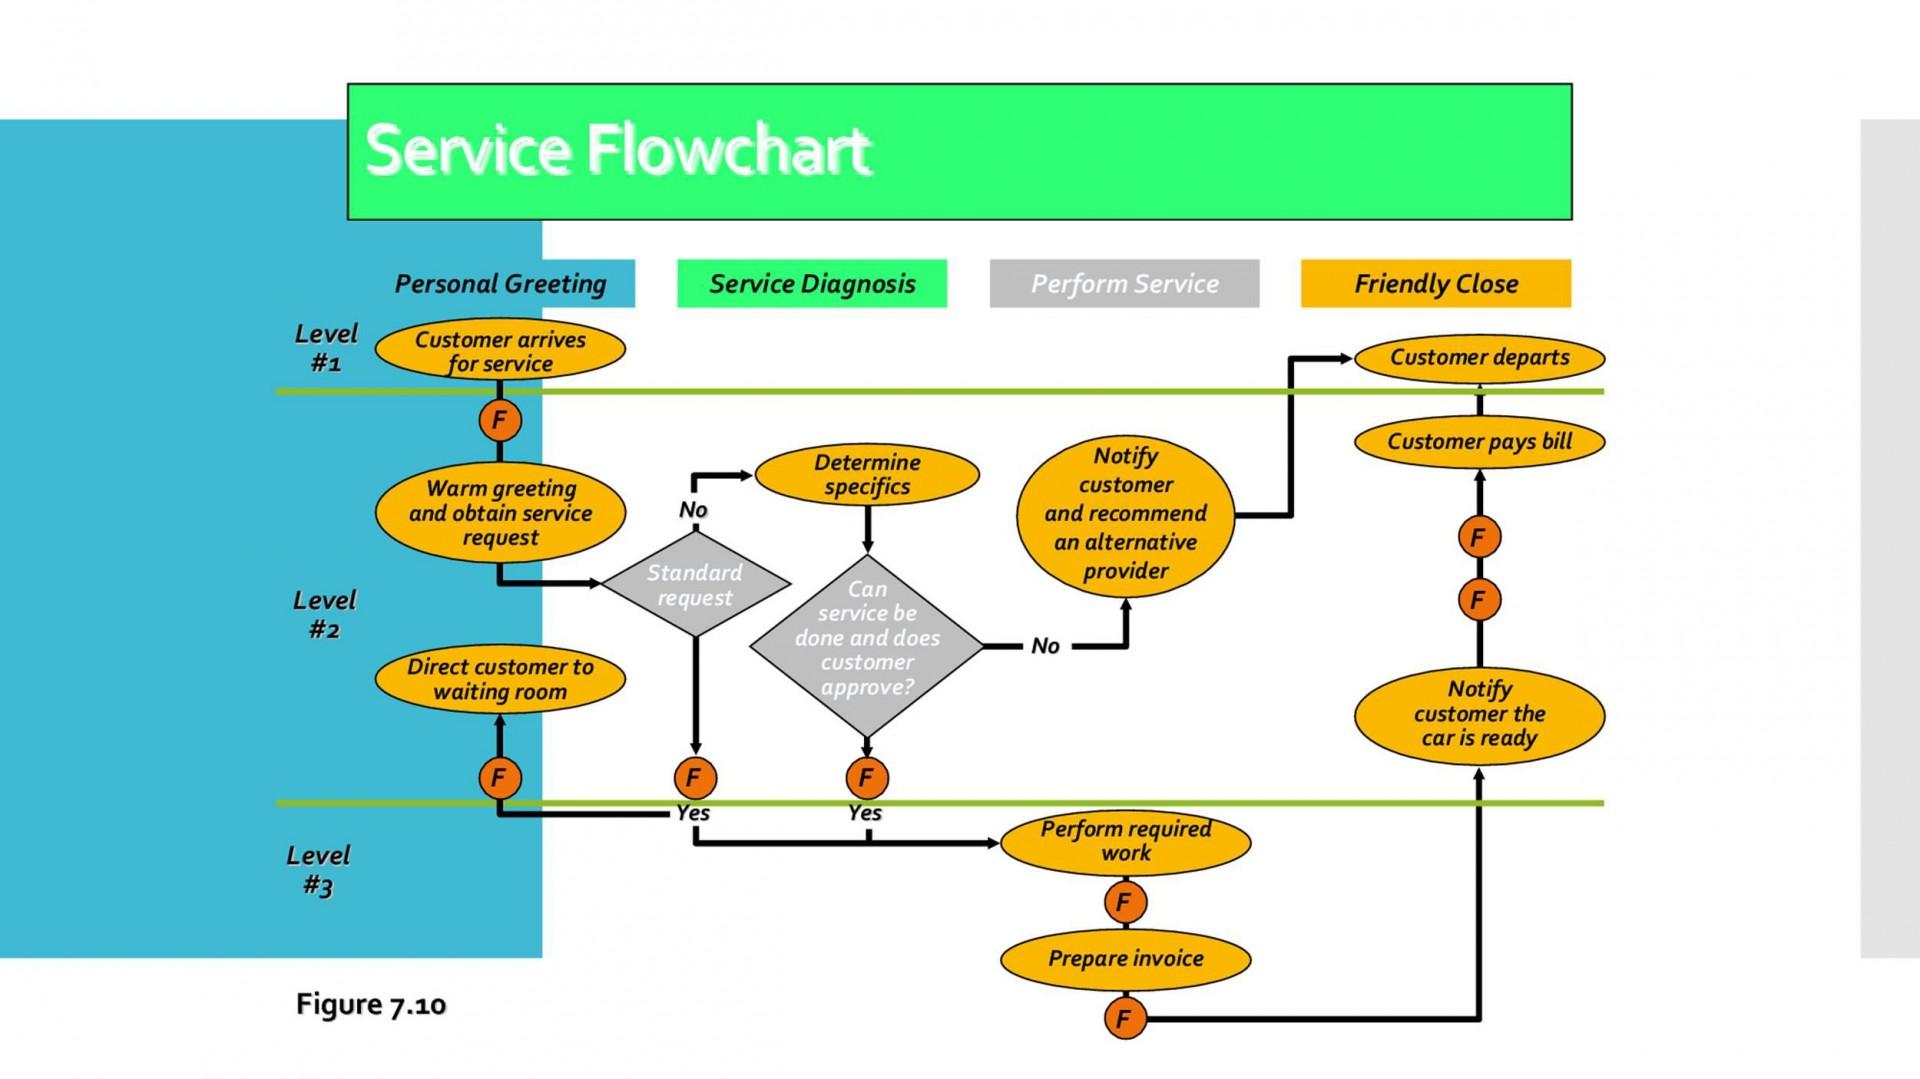 006 Fantastic Excel Flow Chart Template Inspiration  Templates Basic Flowchart Microsoft Free 20101920